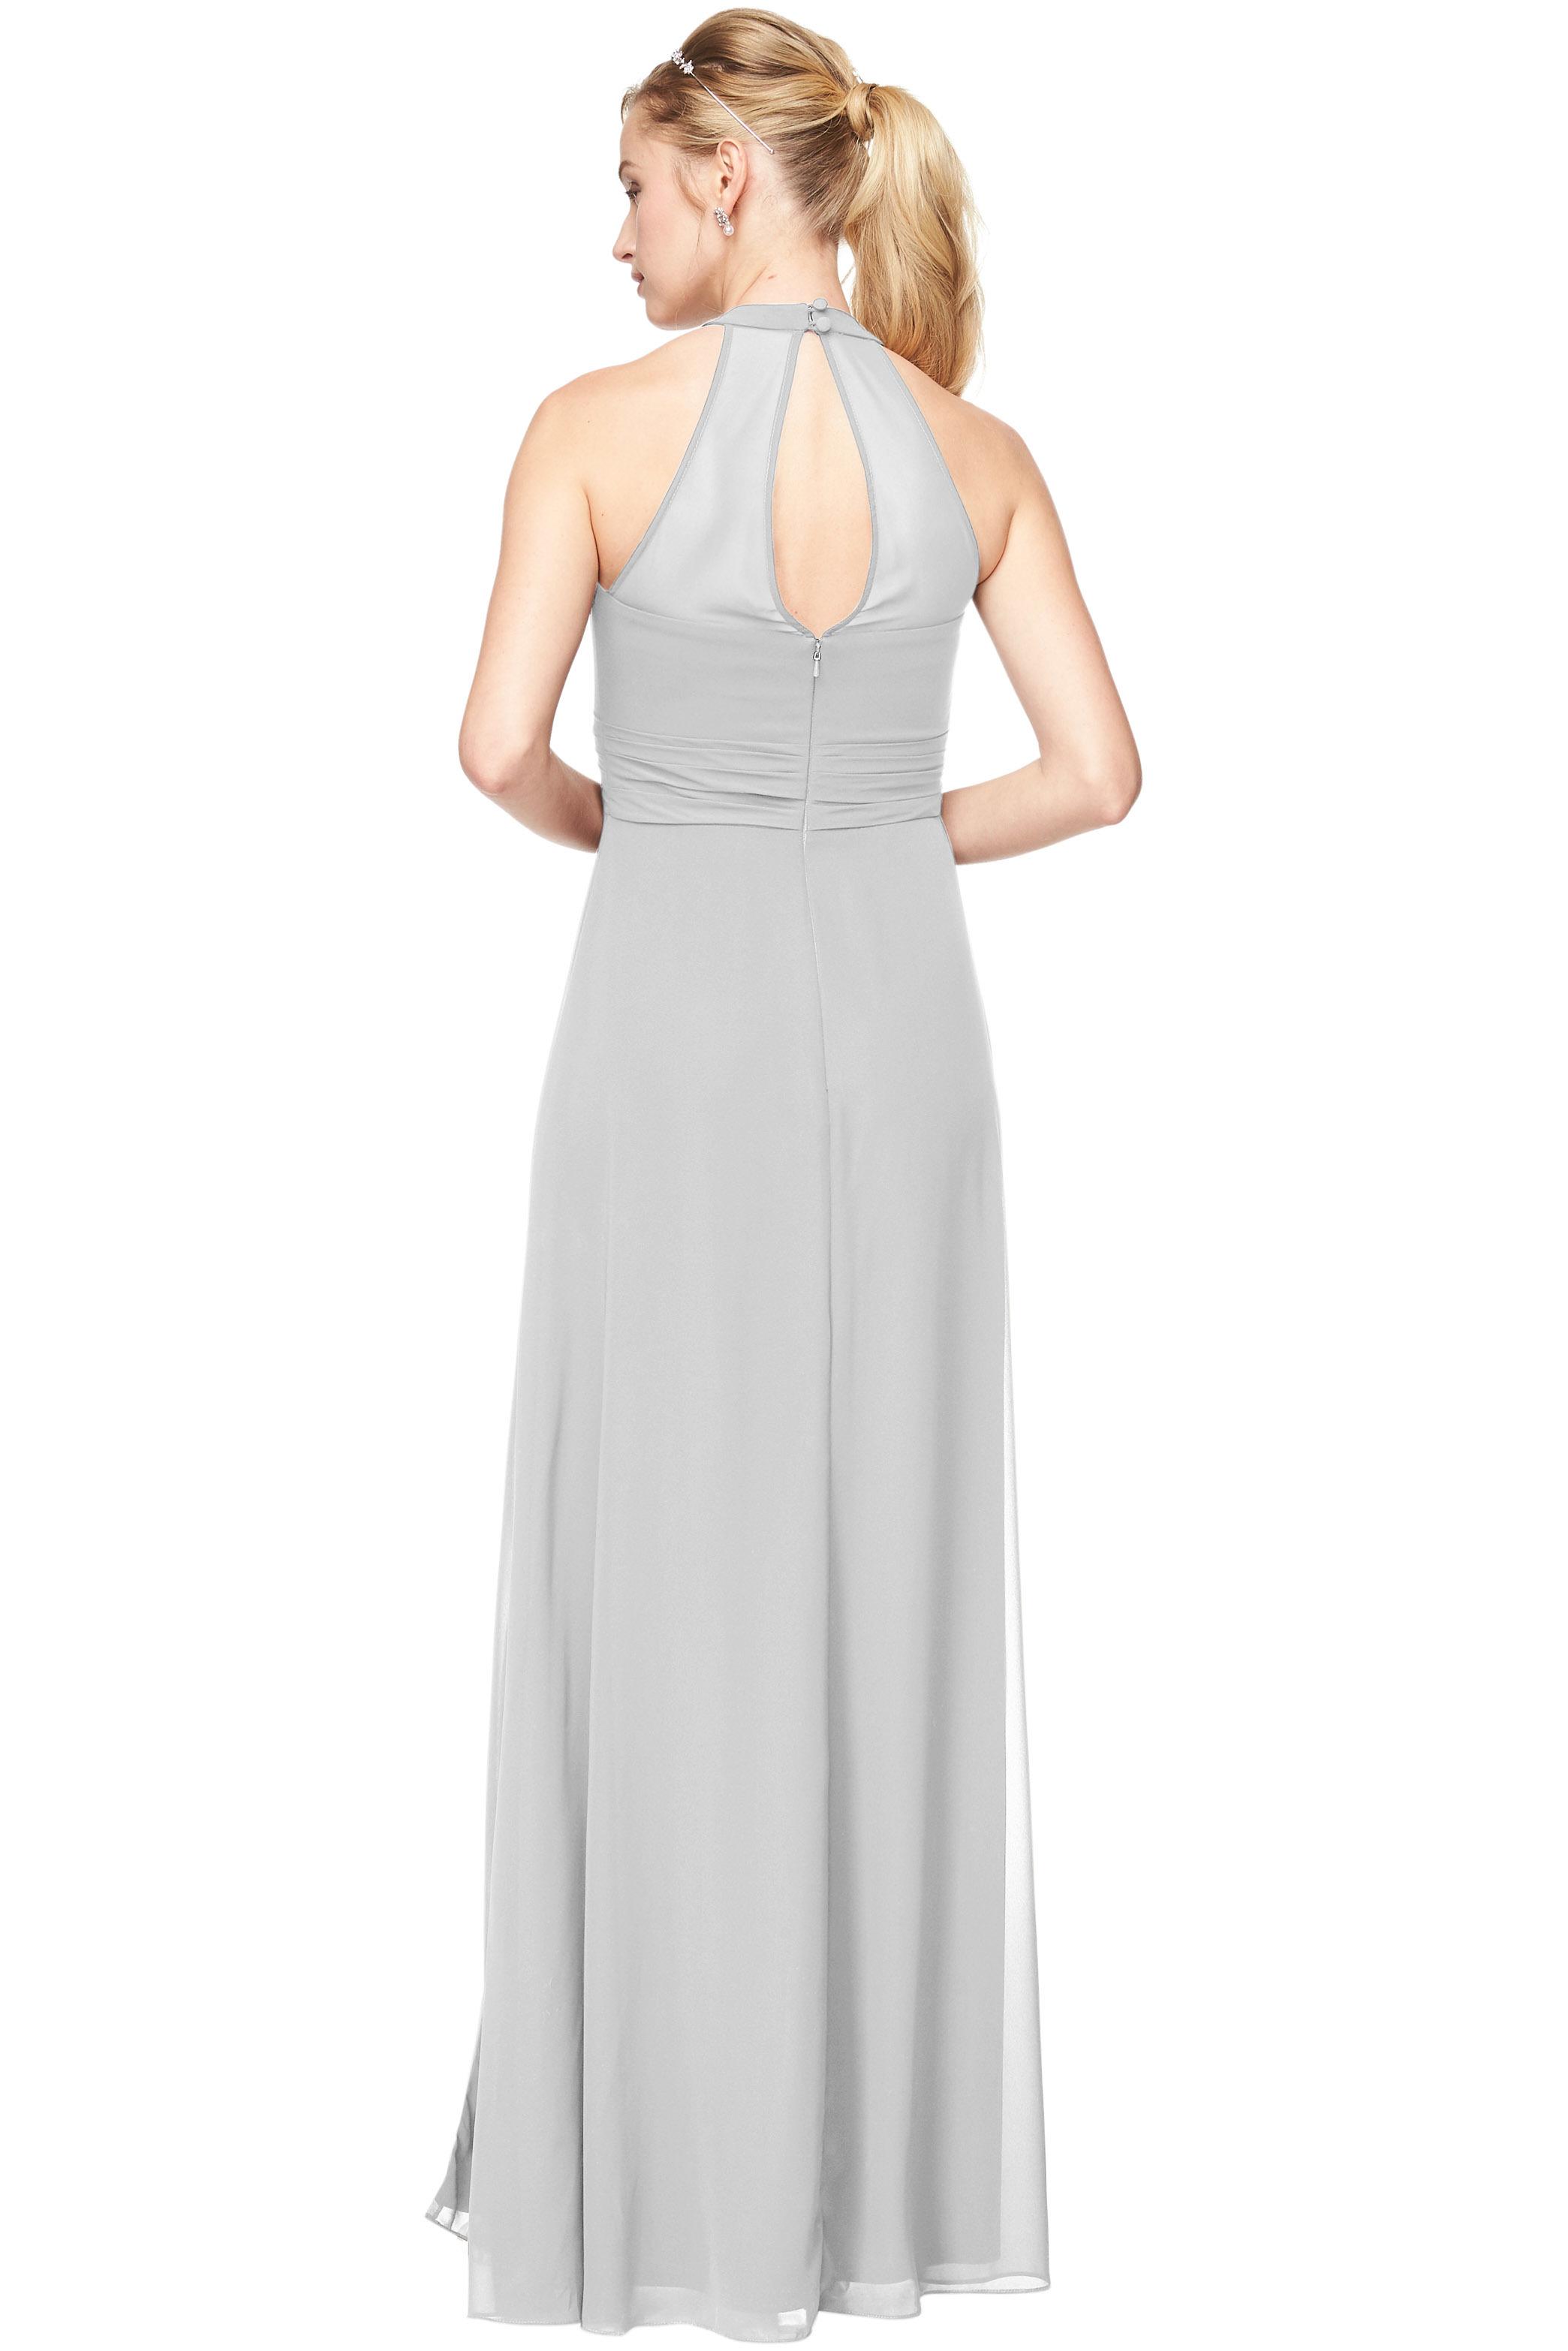 Bill Levkoff DESERT GREY Chiffon V-Neck, Halter A-Line gown, $198.00 Back